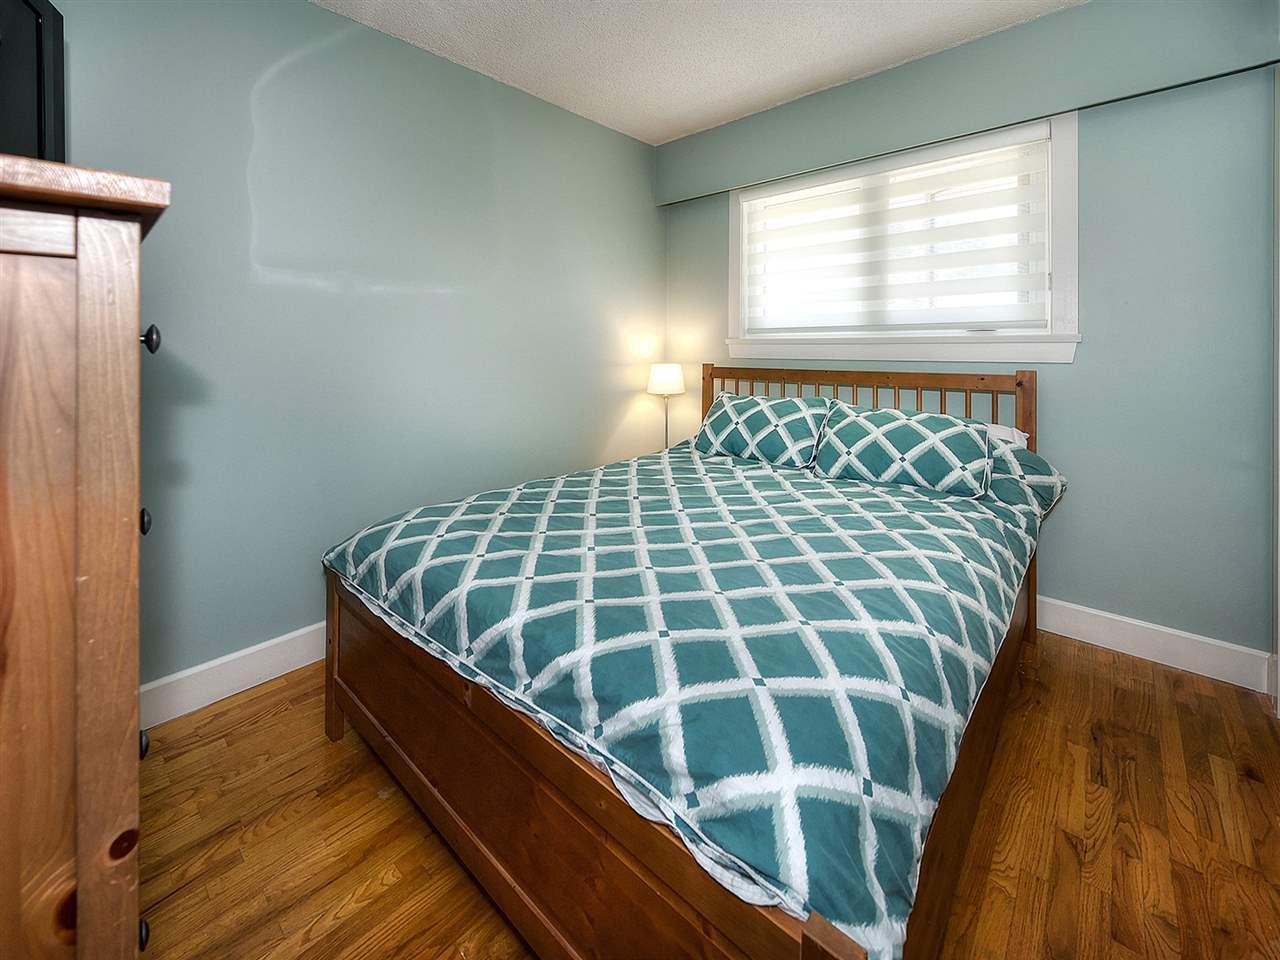 Photo 11: Photos: 1067 WILMINGTON Drive in Delta: Tsawwassen Central House for sale (Tsawwassen)  : MLS®# R2090180